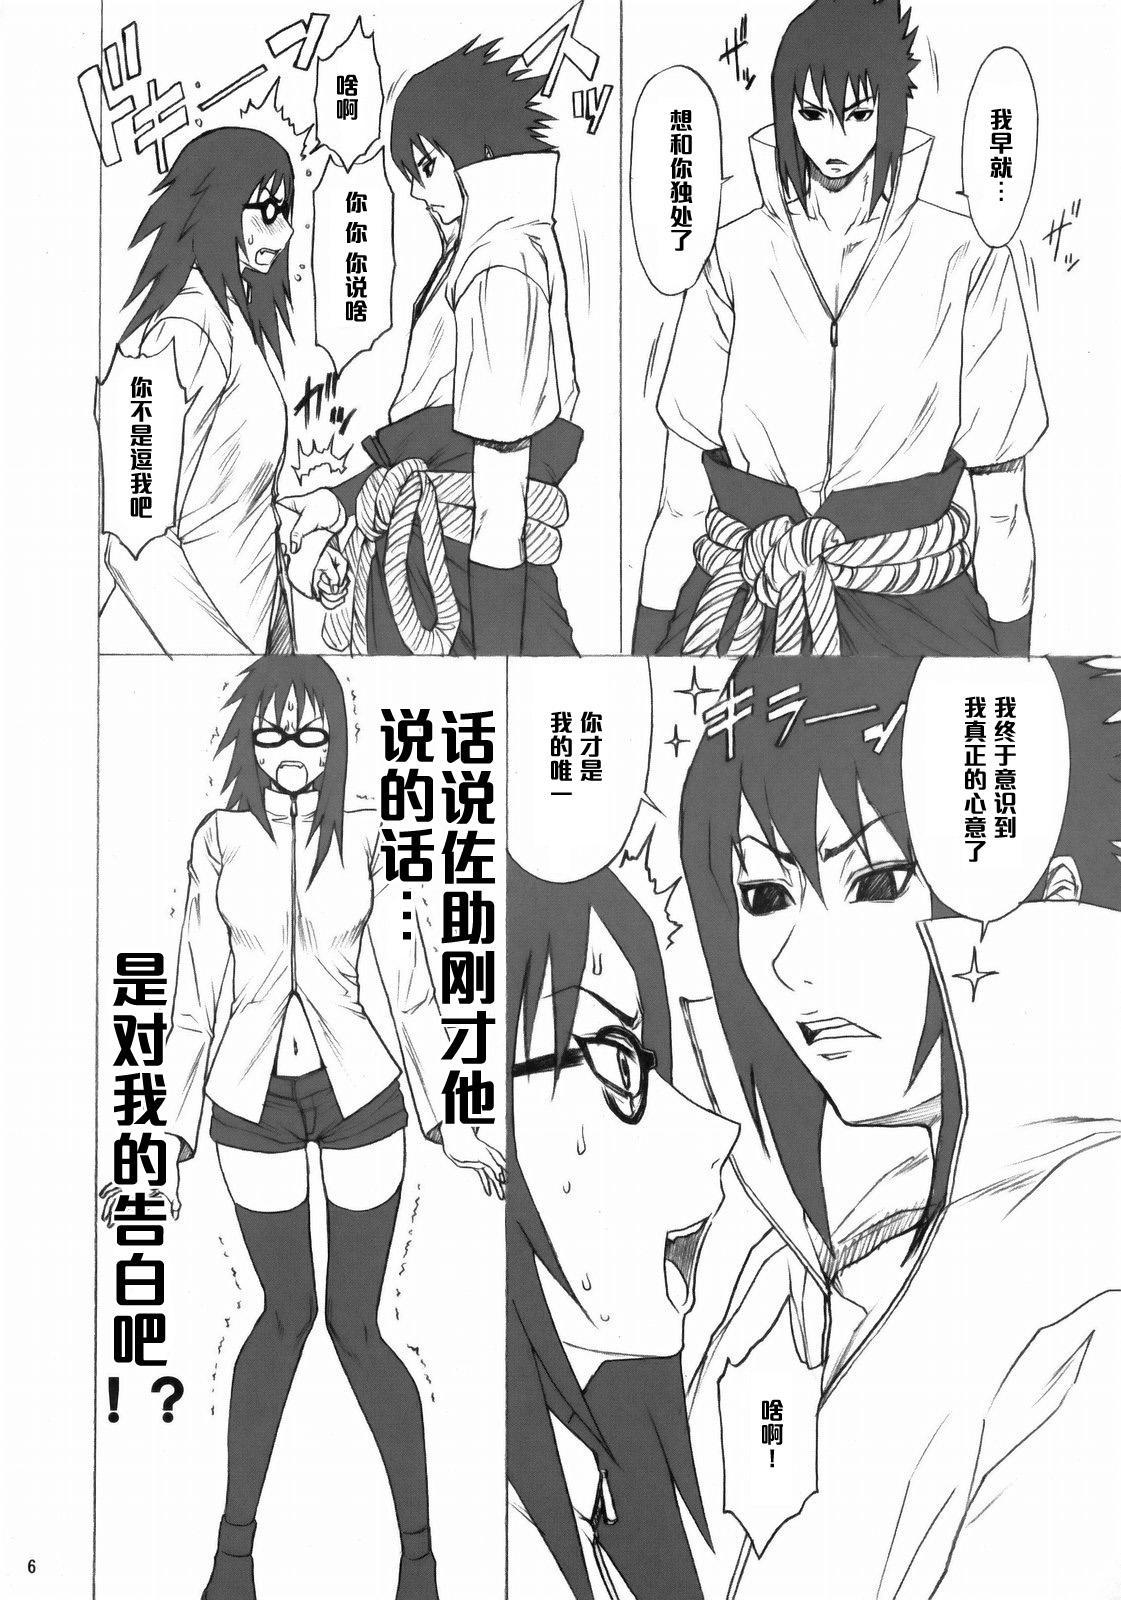 NINJA EXTREME 3 Onna Goroshi Shippuuden 4